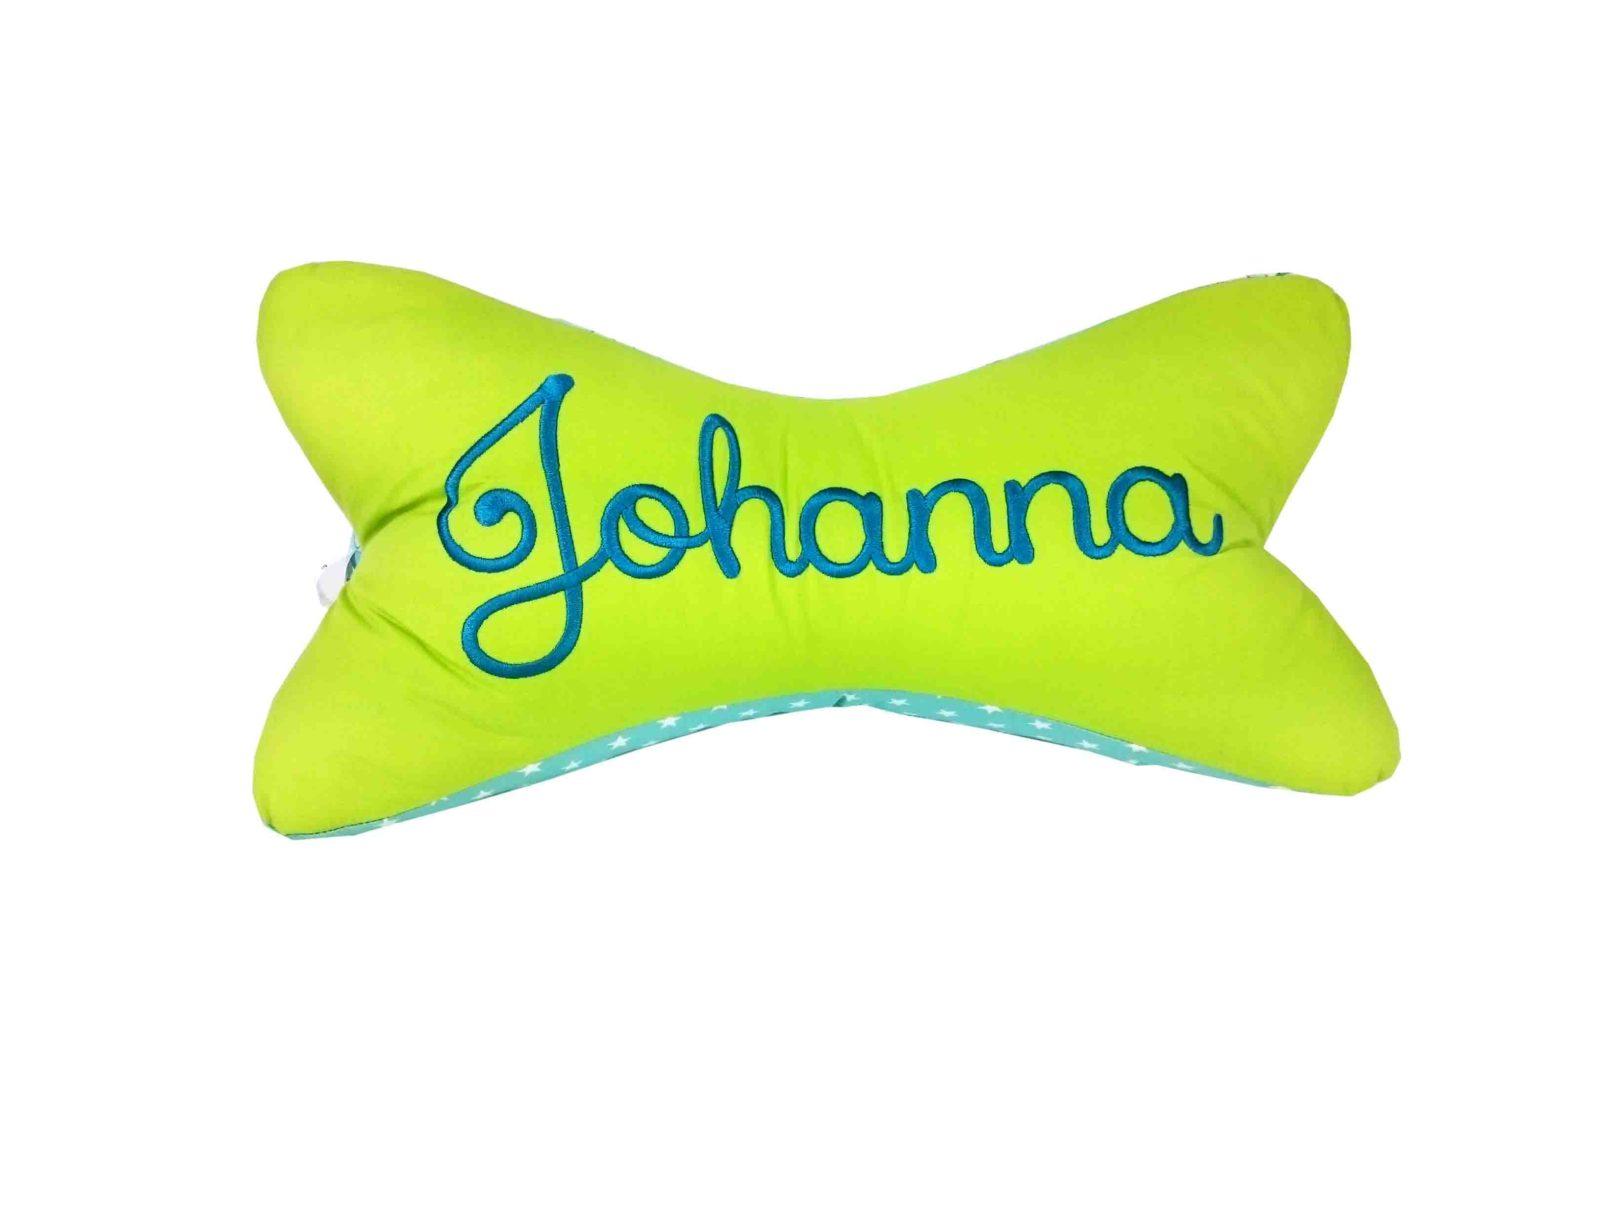 Leseknochen_Johanna1